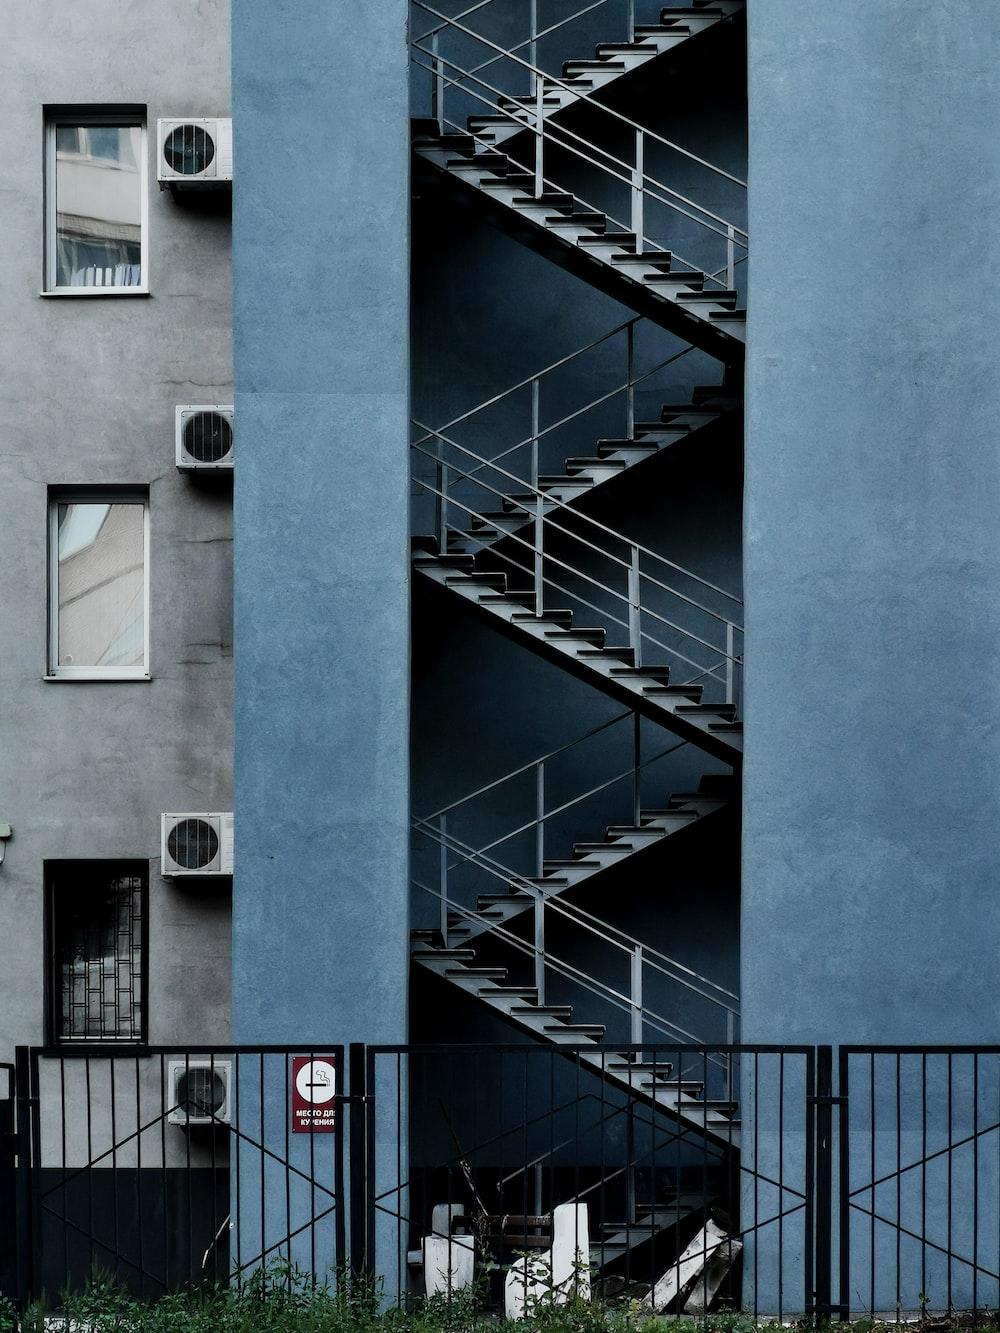 blue concrete building with white metal railings